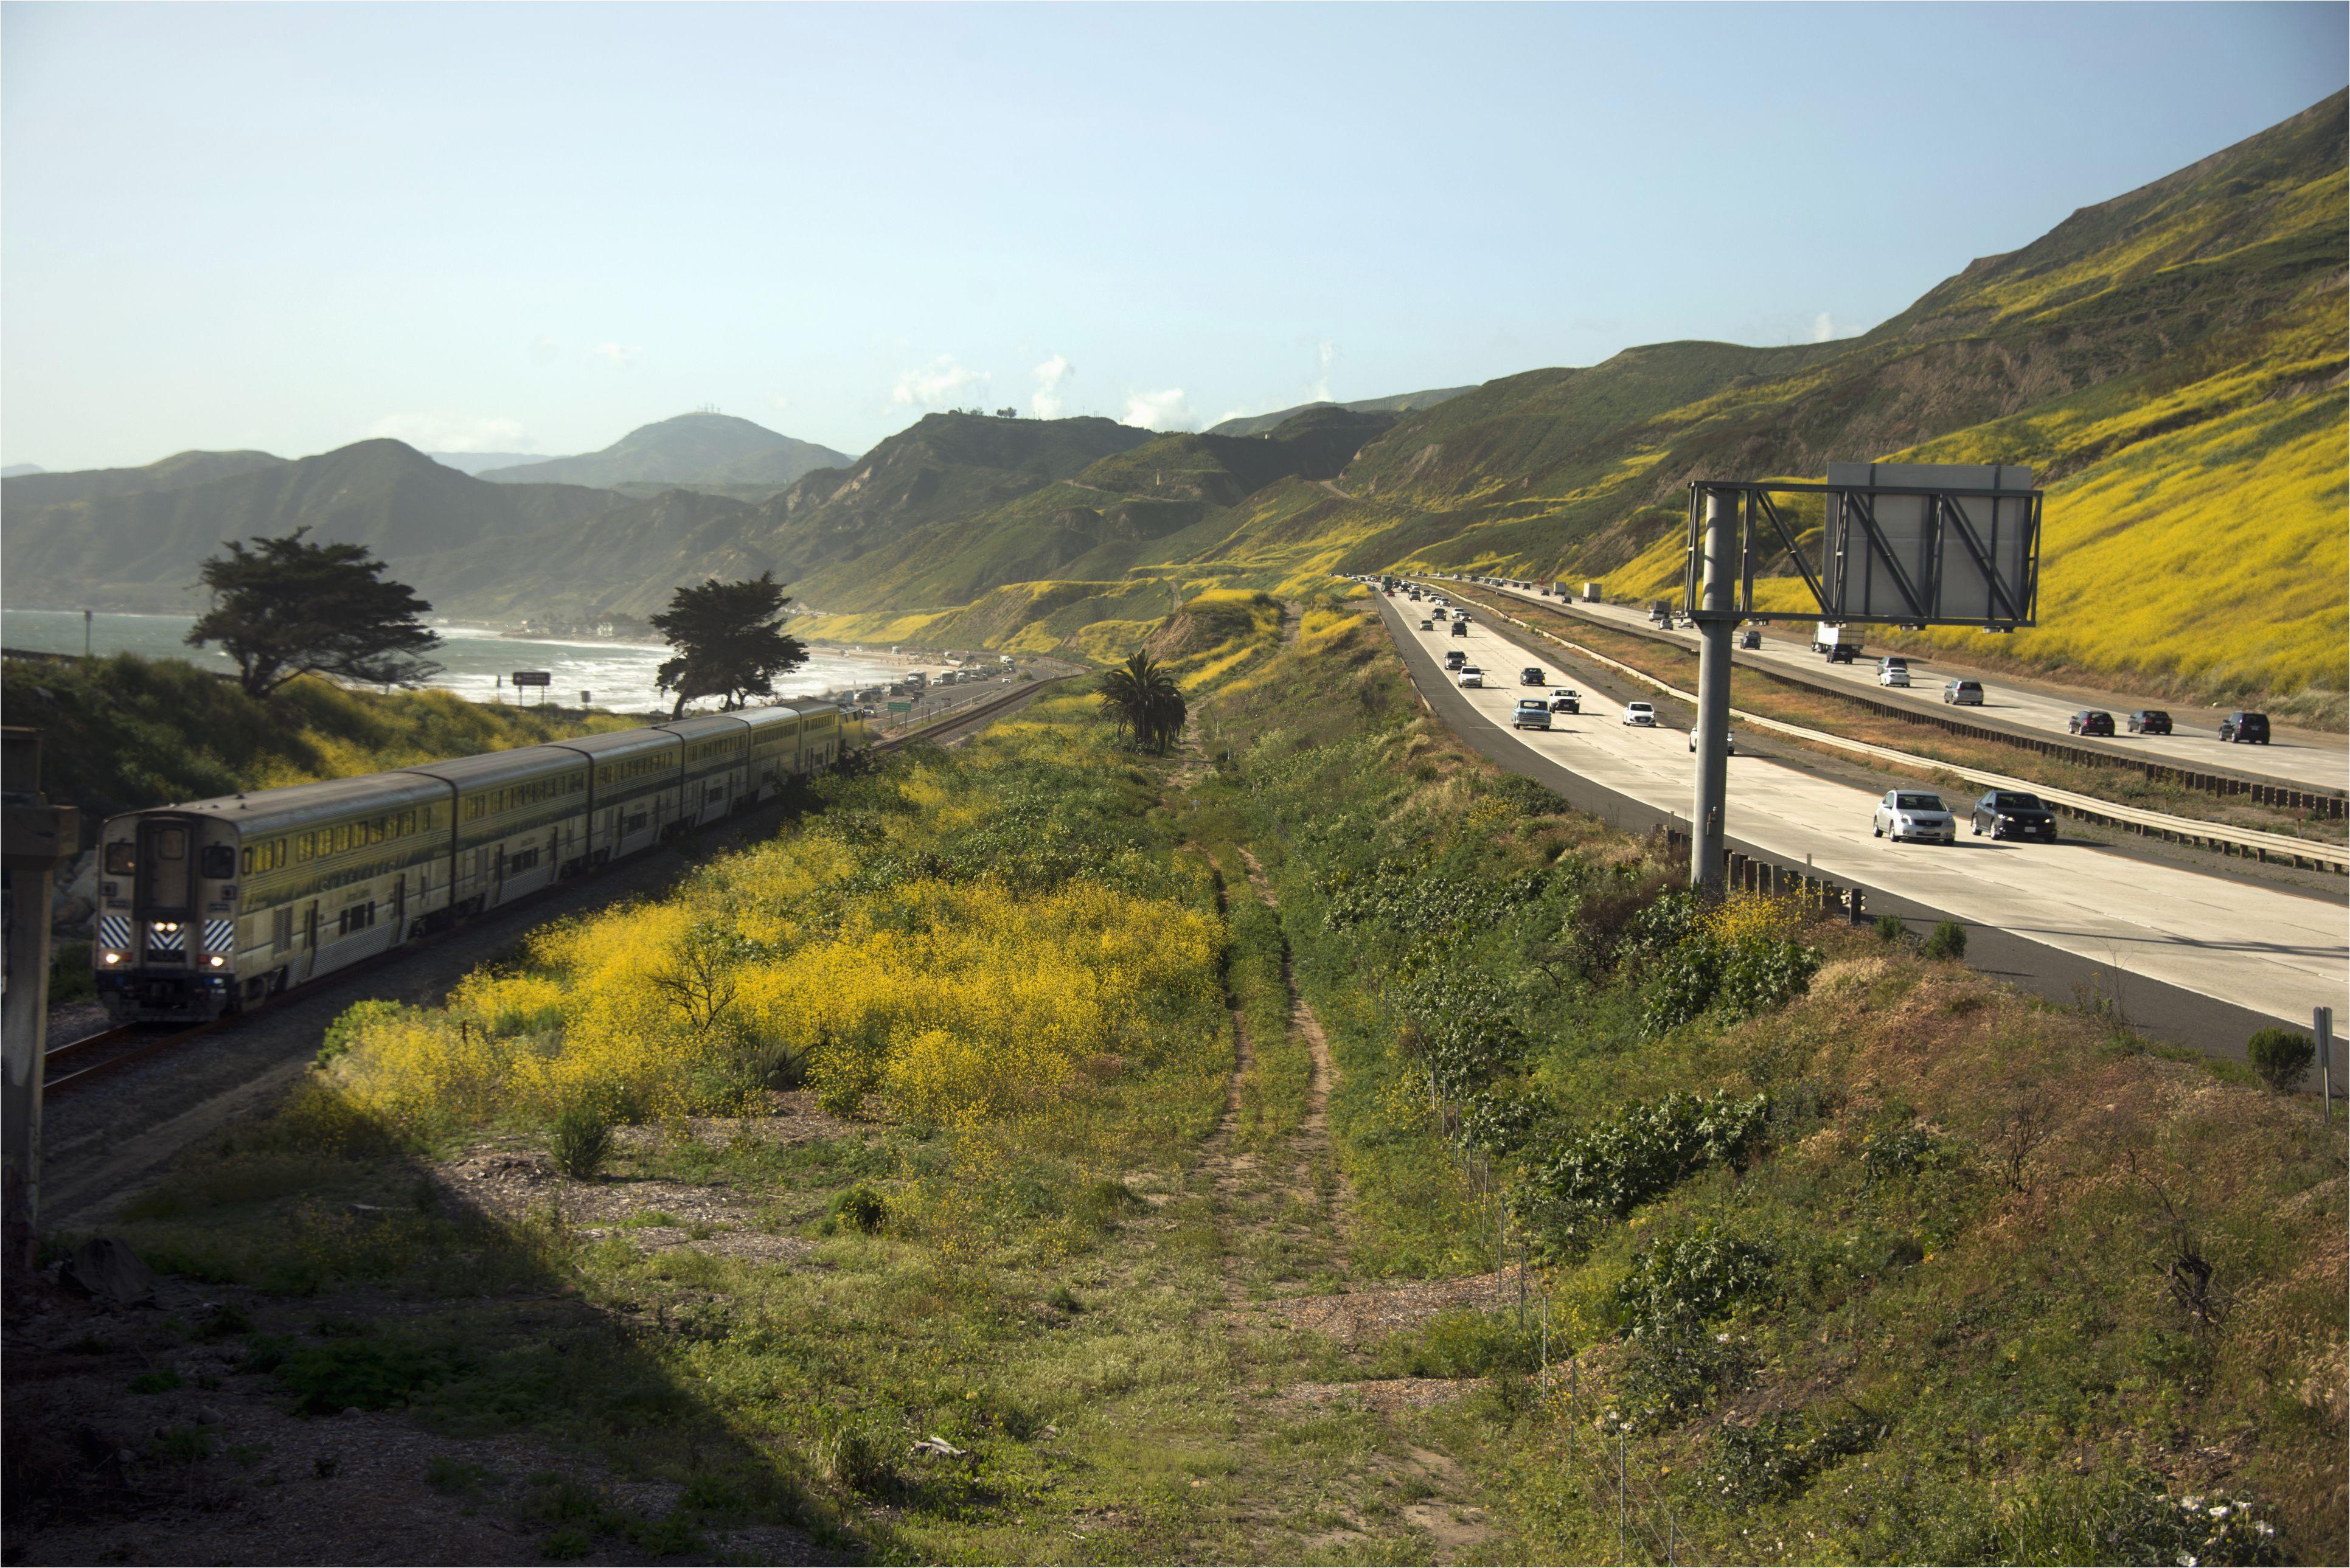 highway 1 california road trip map valid california highway 101 la